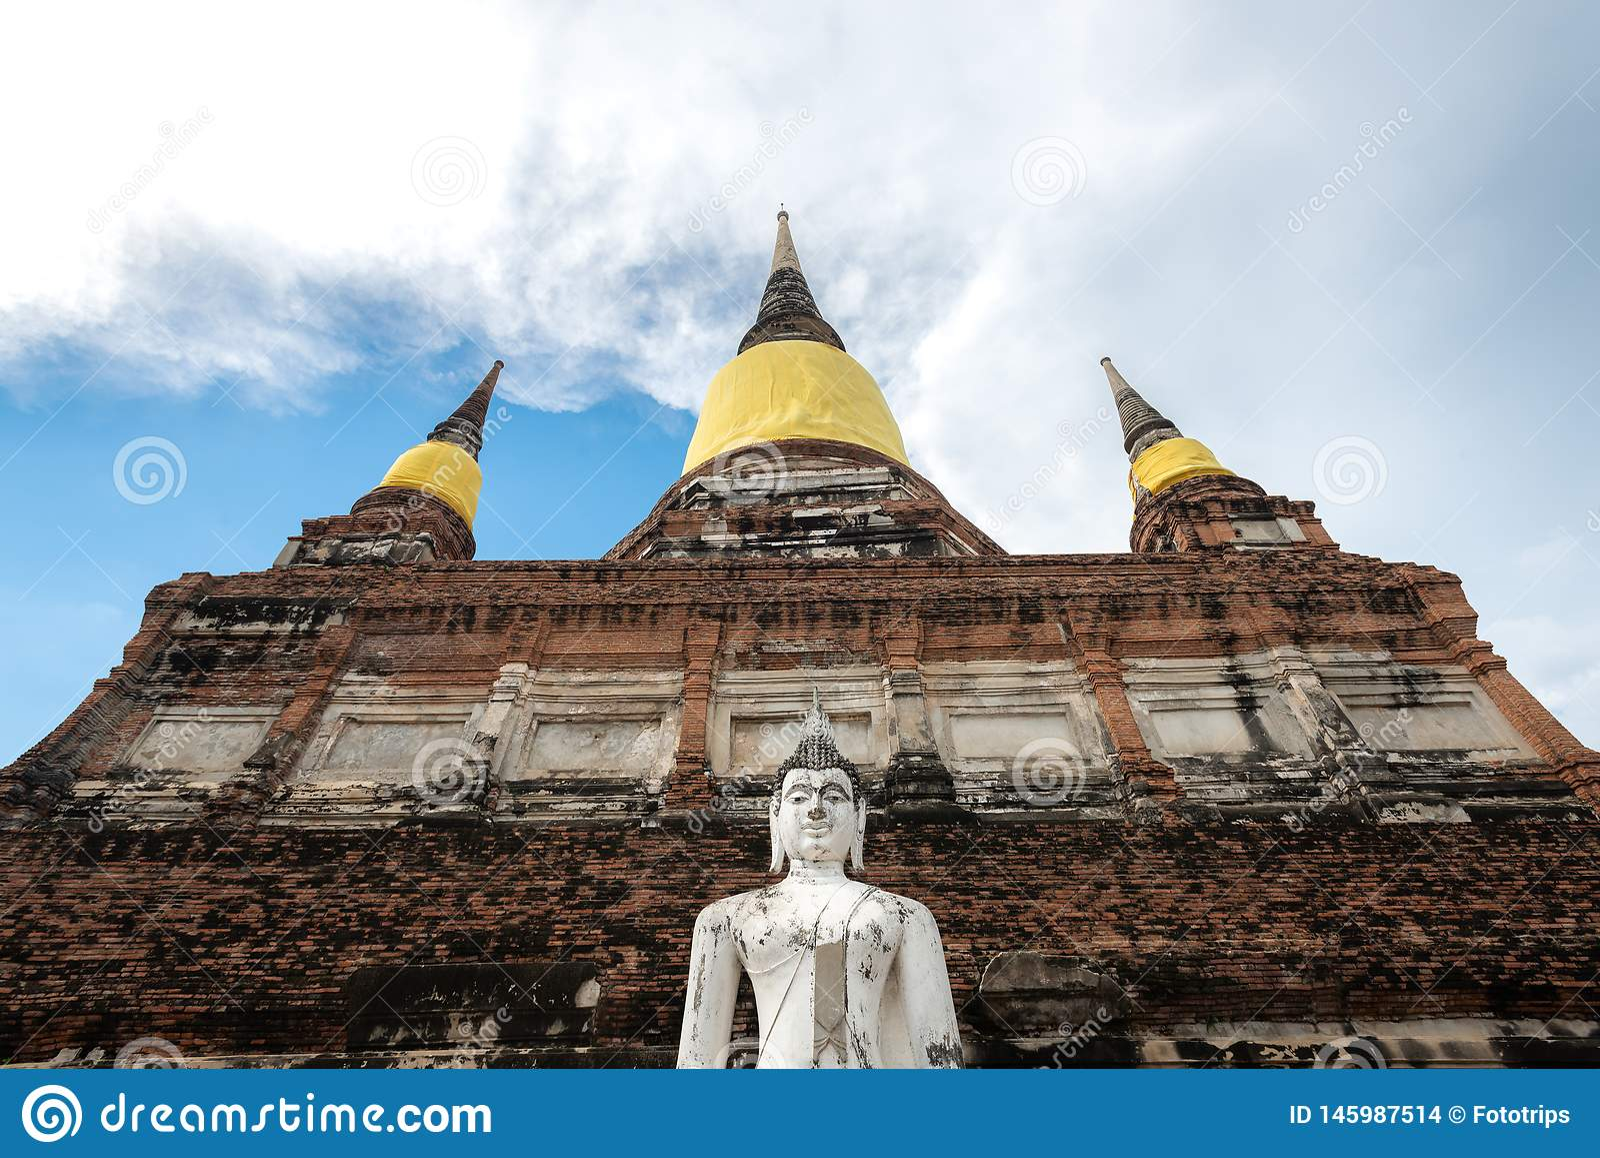 Thailand`s Temple - Old pagoda at Wat Yai Chai Mongkhon, Ayutthaya Historical Park, Thailand